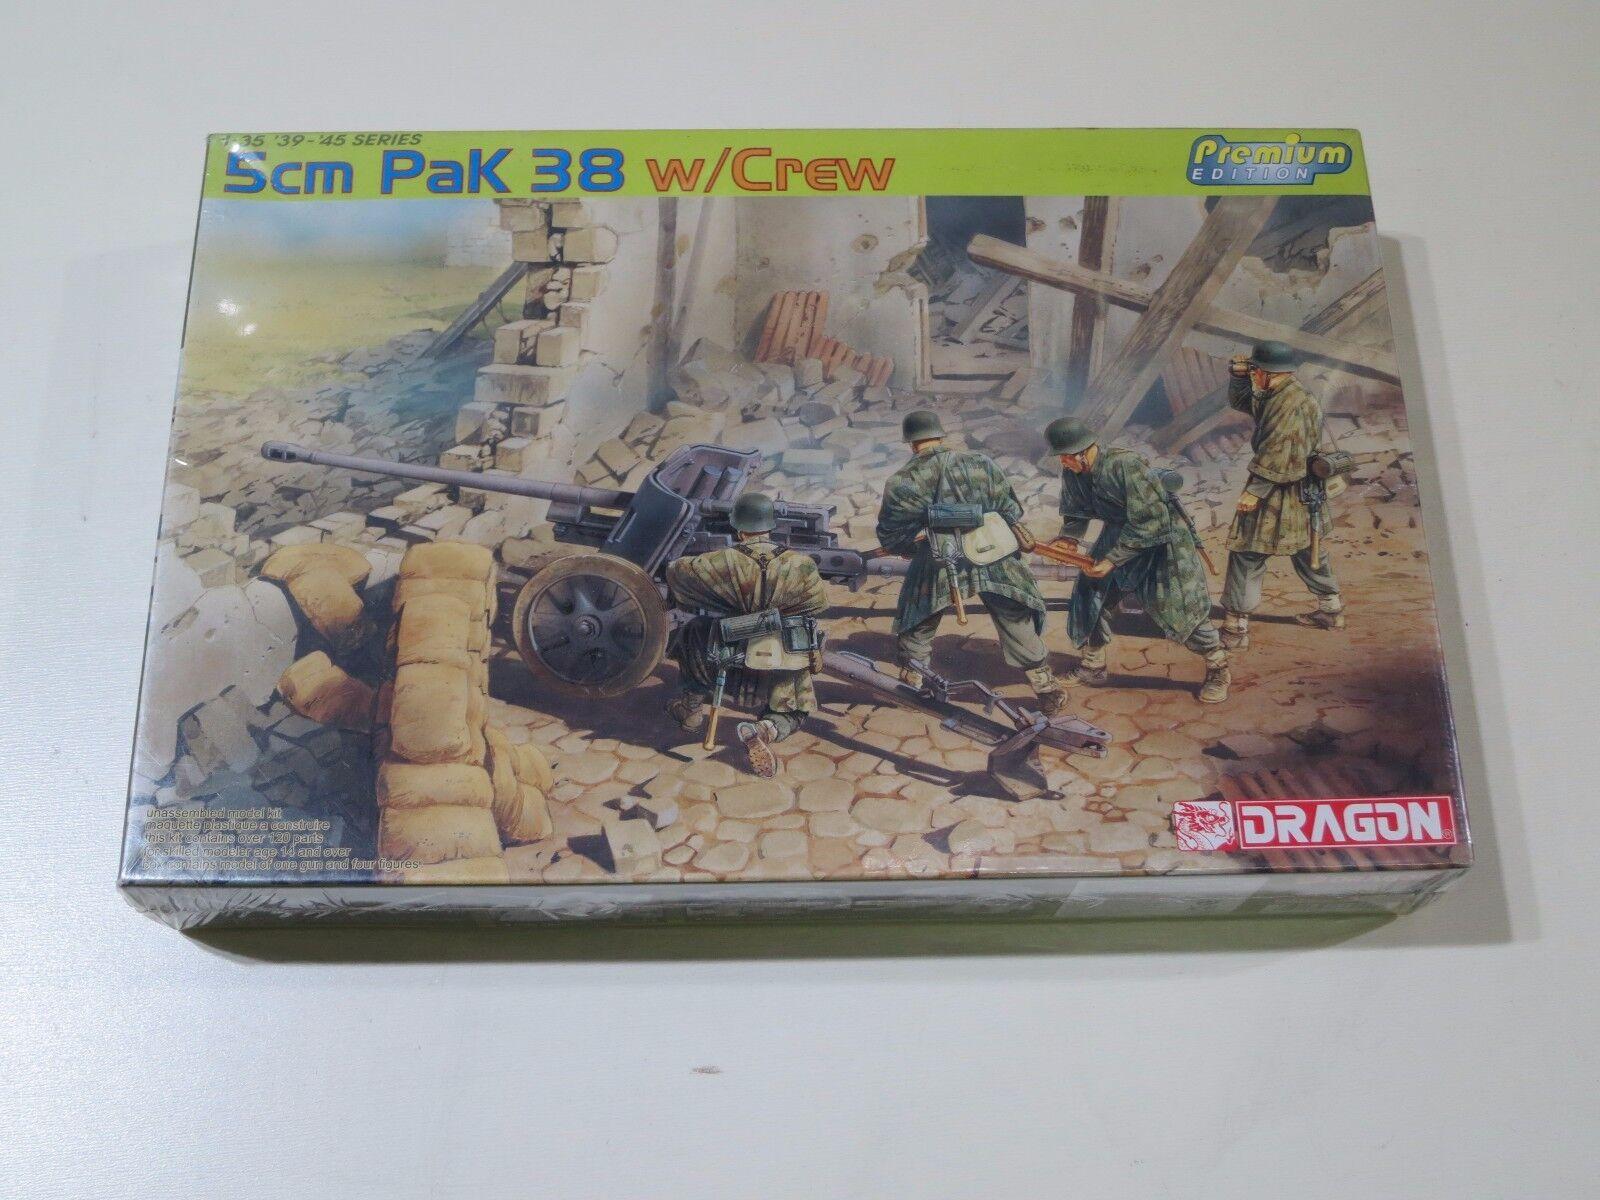 DRAGON 1 35 5cm Pak 38 w Crew Model Kit NEW Premium Edition '39-'45 Series